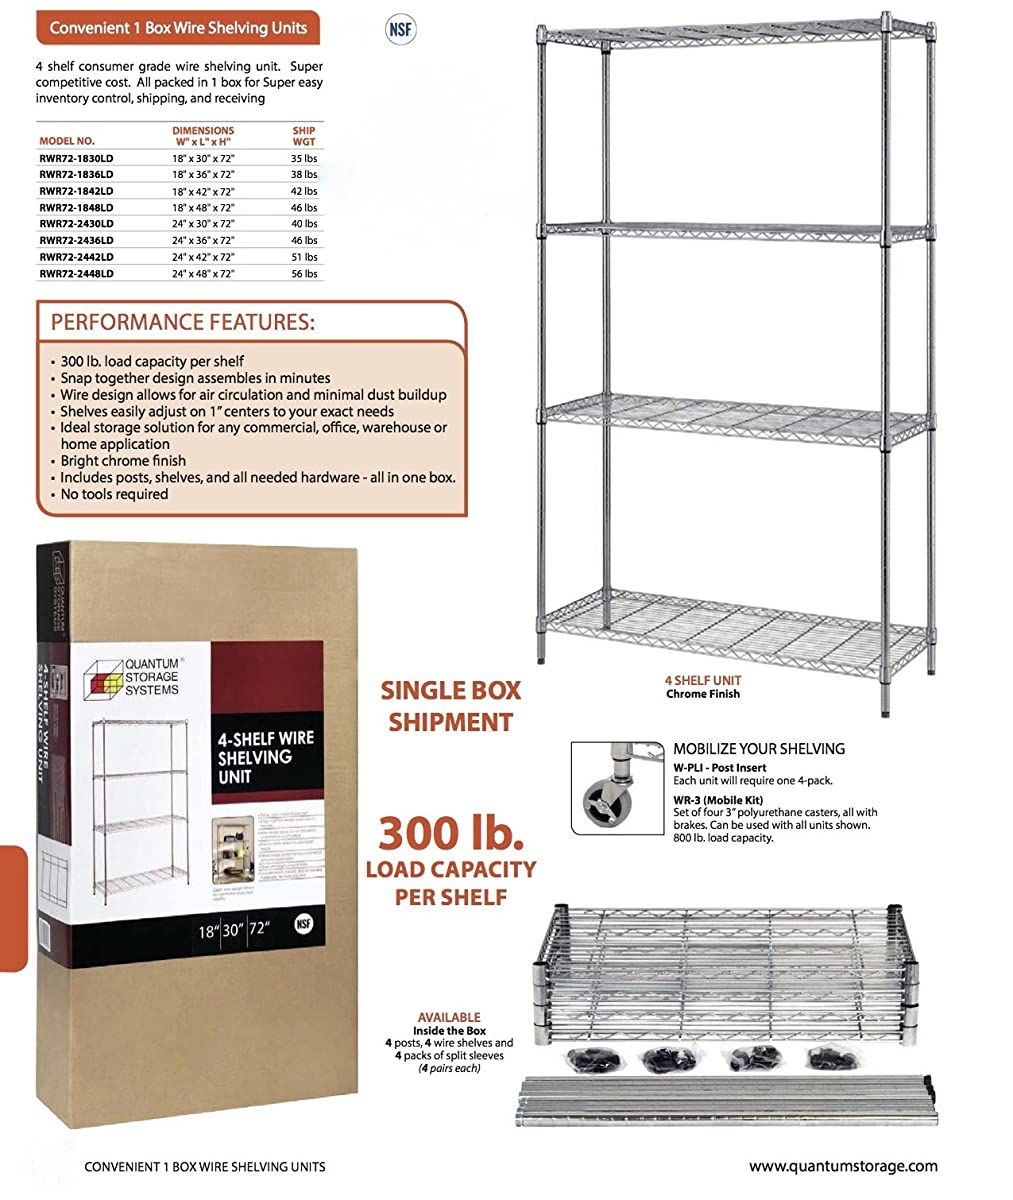 "Quantum Storage Systems RWR72-1848LD 4-Tier Wire Shelving Unit, Chrome Finish, 300 lb. Per Shelf Capacity, 72"" Height x 48"" Width x 18"" Depth"